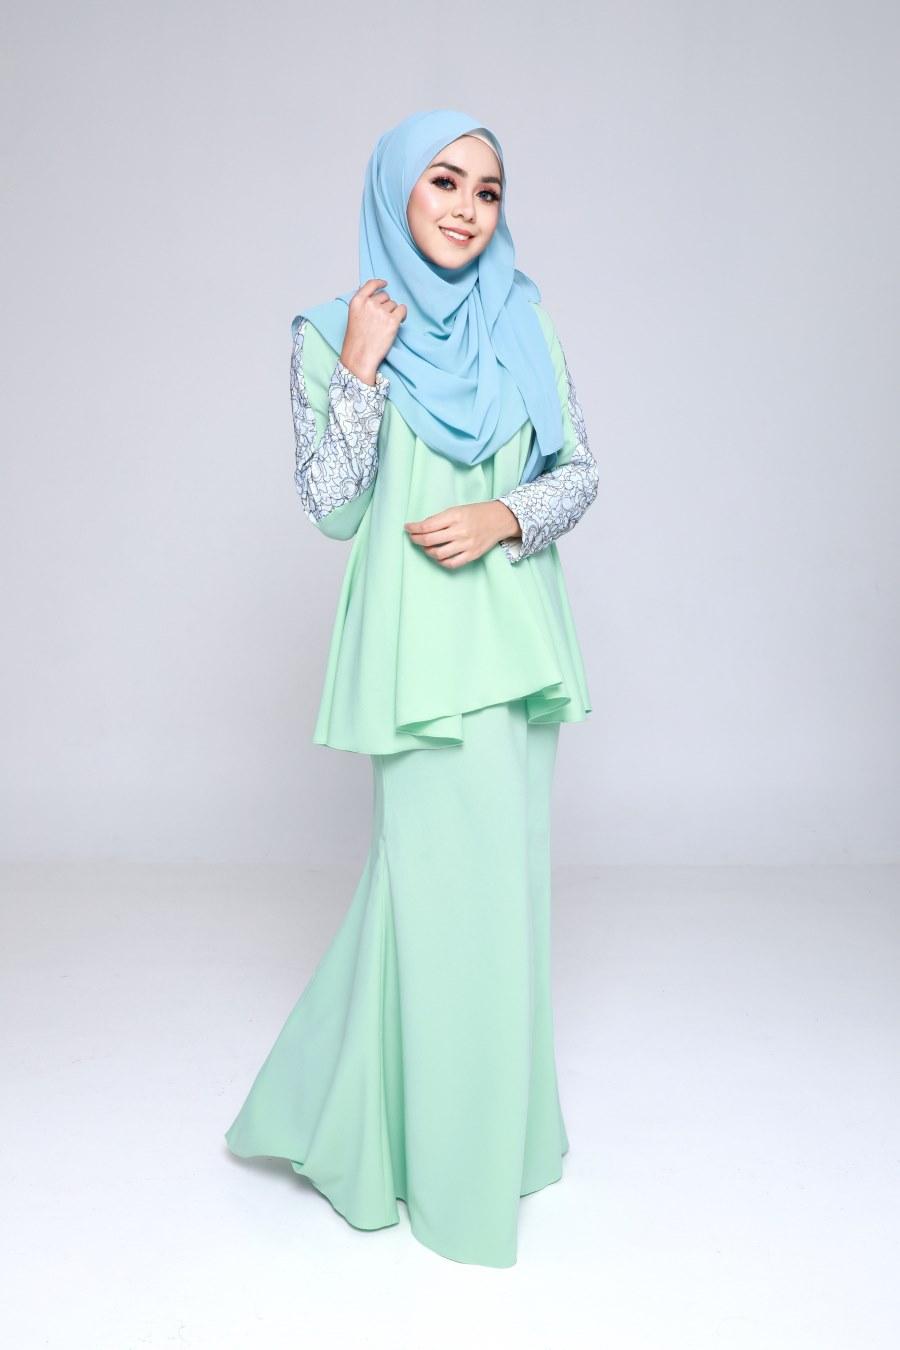 baju pengantin warna hijau turquoise baju kurung warna